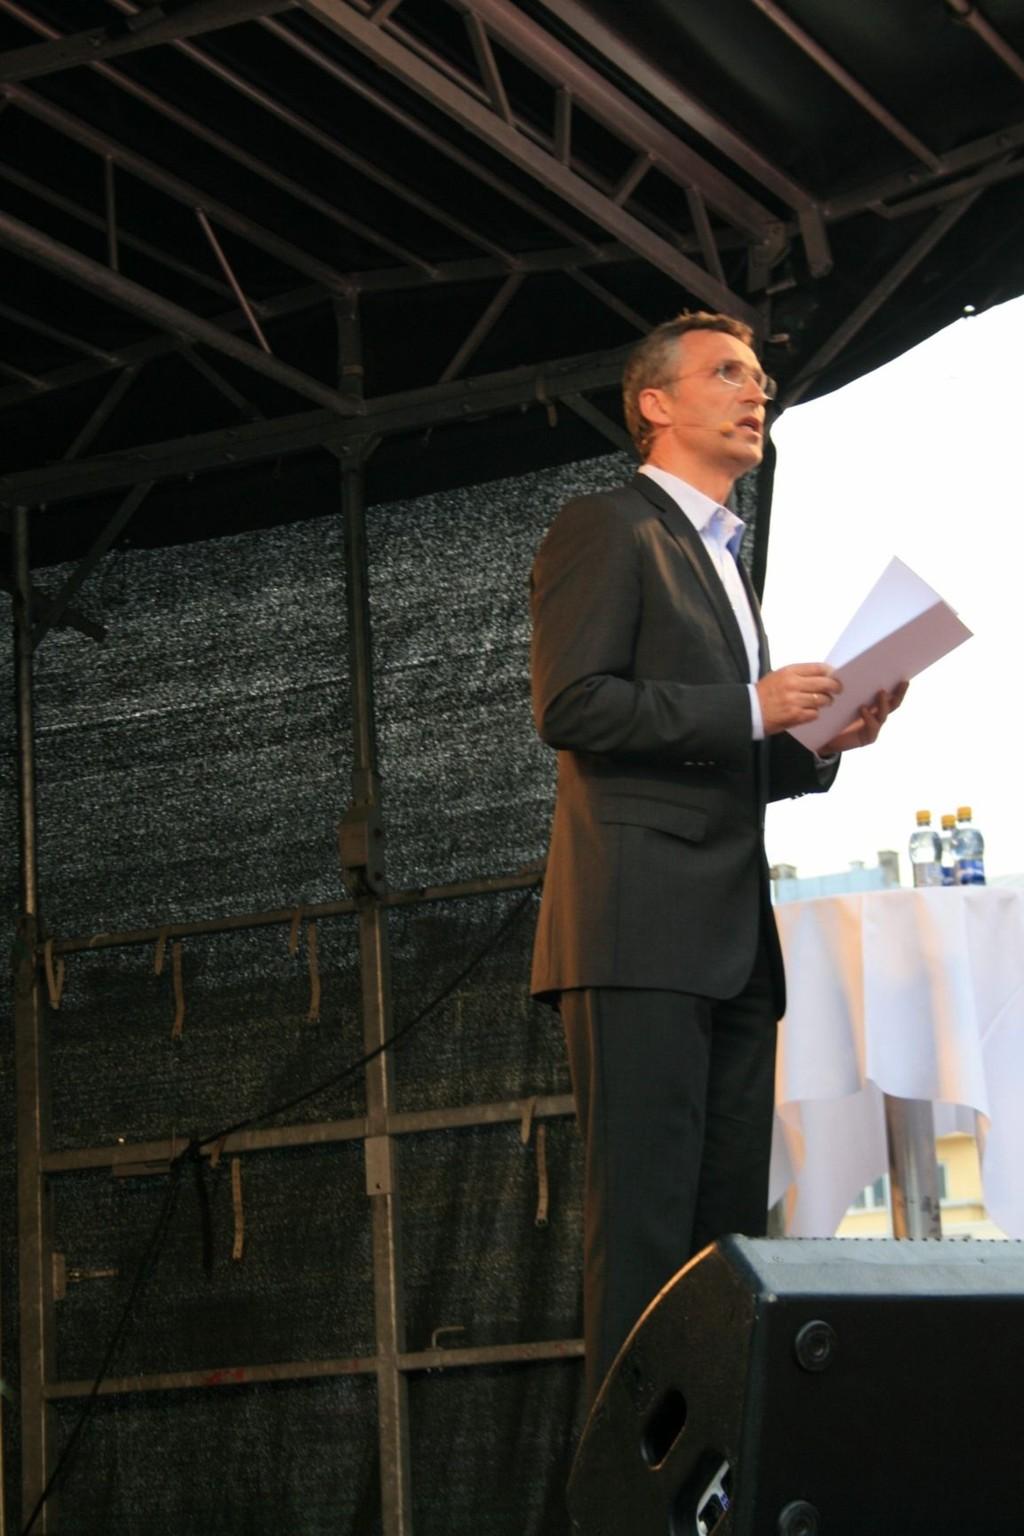 Jens Stoltenberg hyllet Grete Waitz og kalte henne en legende.